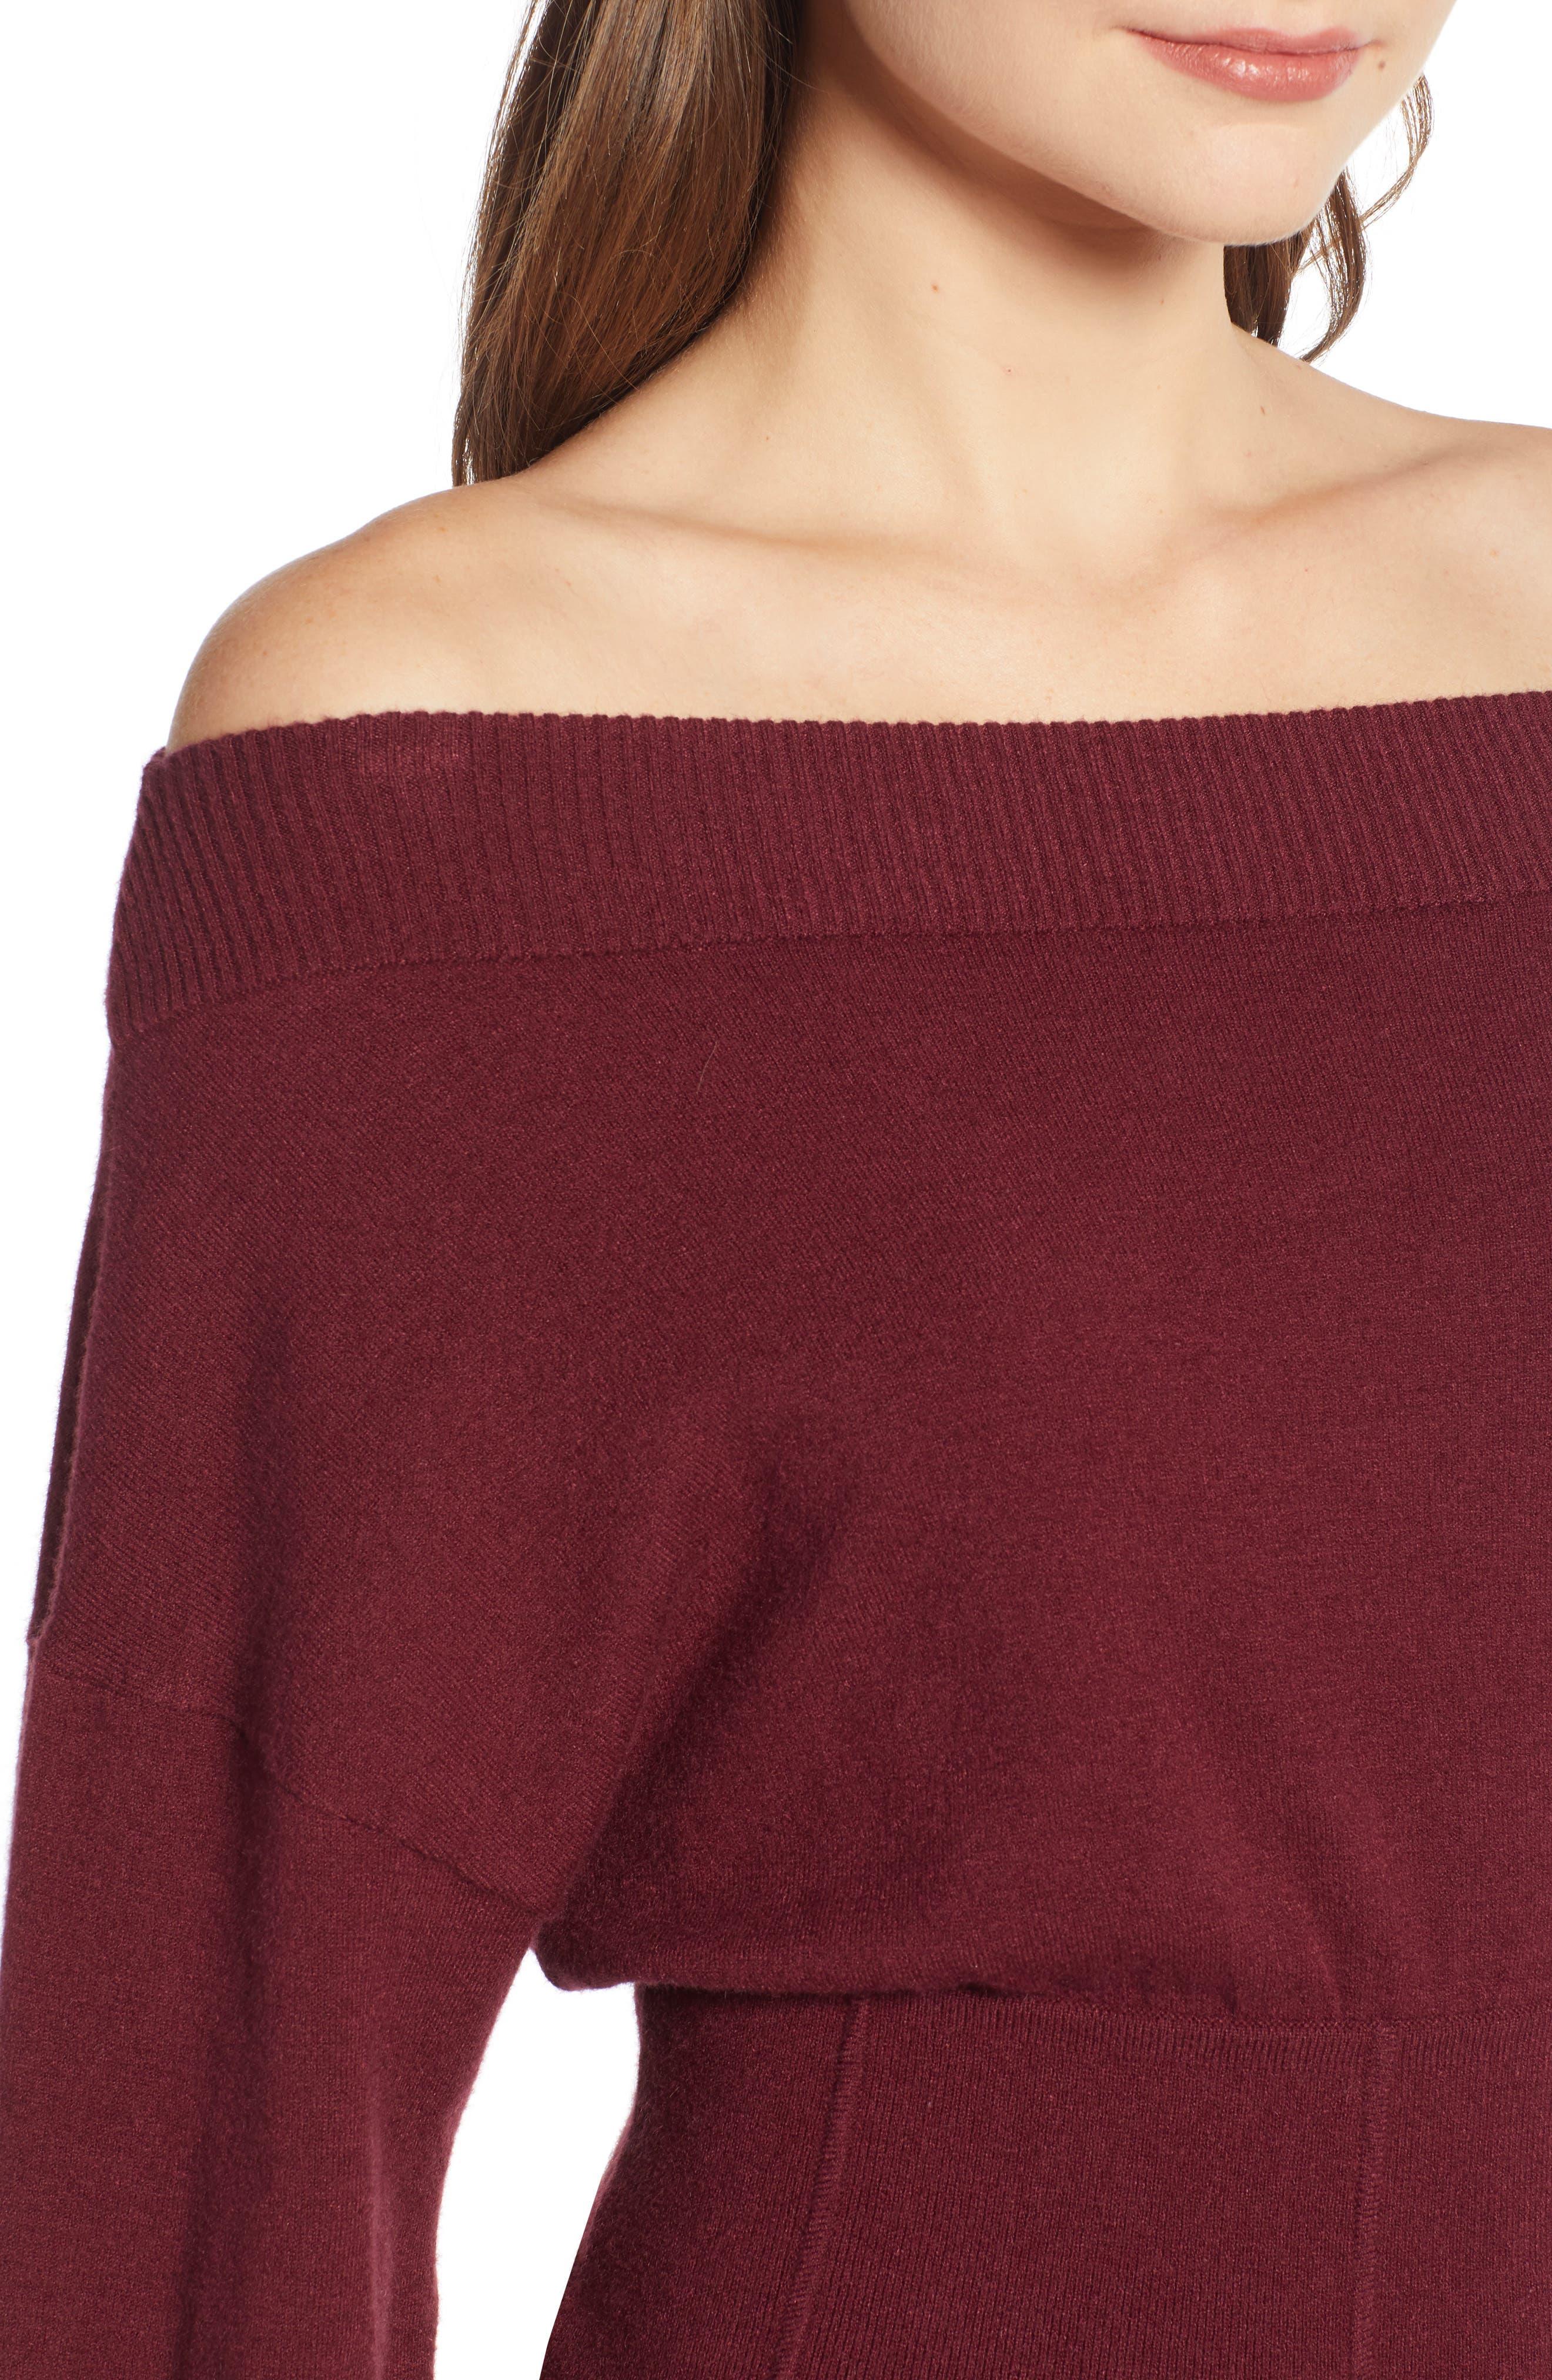 Waist Detail Off the Shoulder Sweater,                             Alternate thumbnail 4, color,                             601